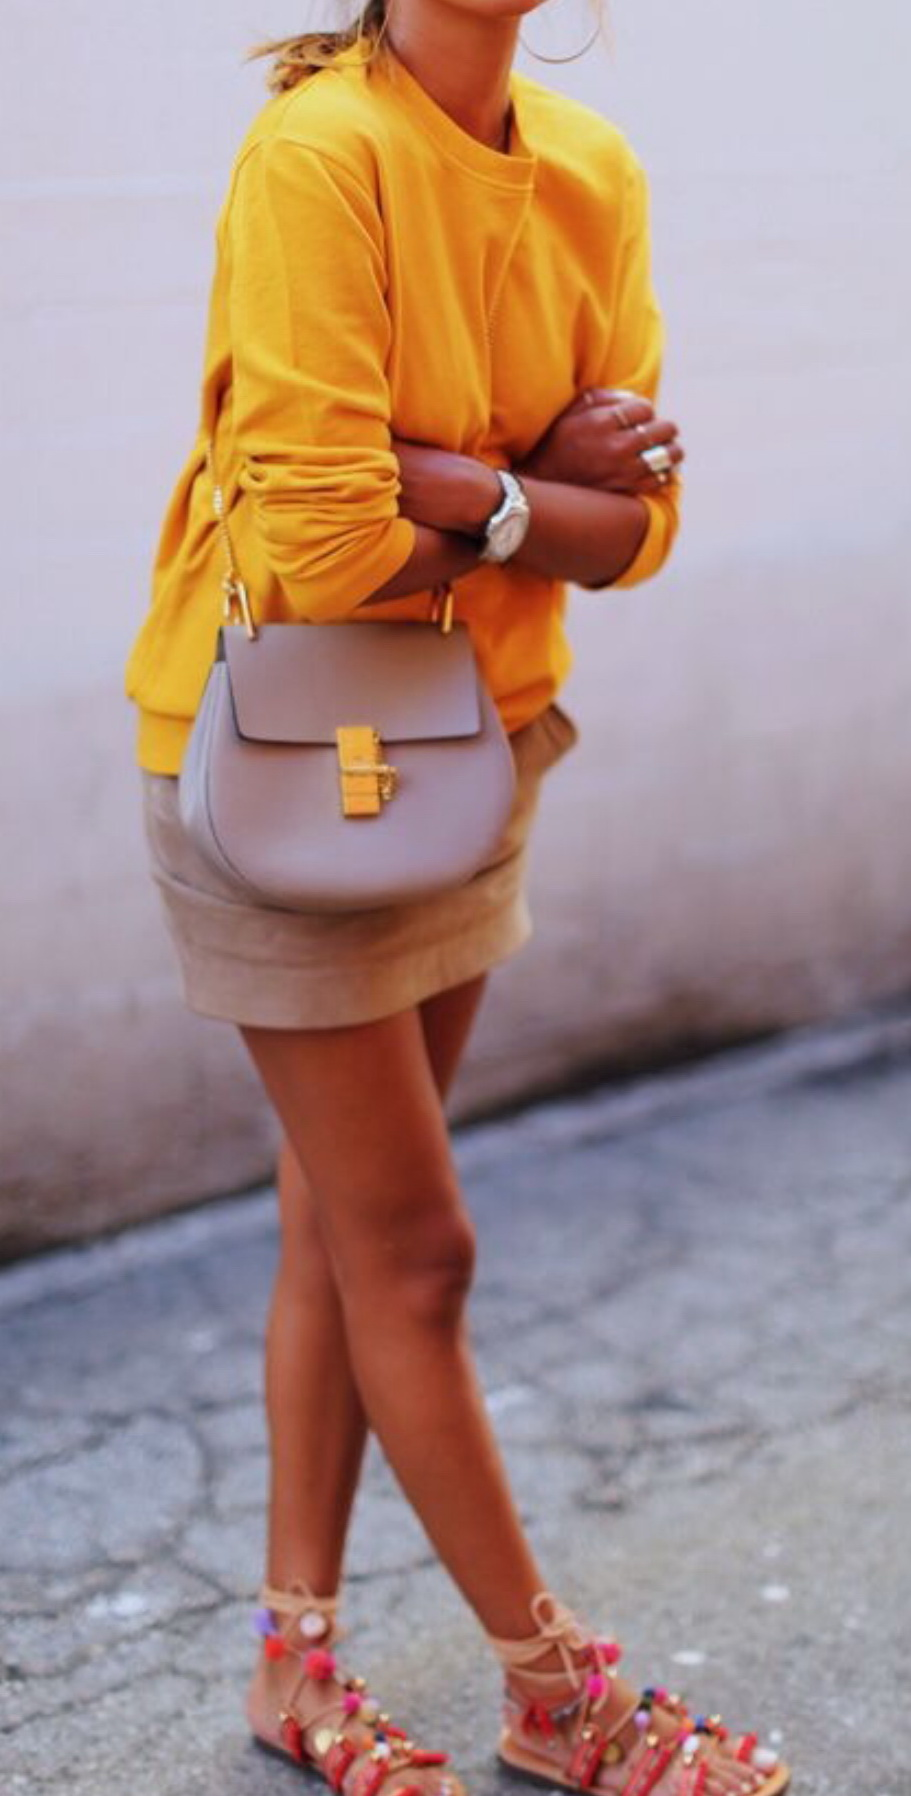 http://www.gofeminin.de/mode-beauty/flache-boho-sandalen-werten-schlichte-looks-auf-sp898173.html